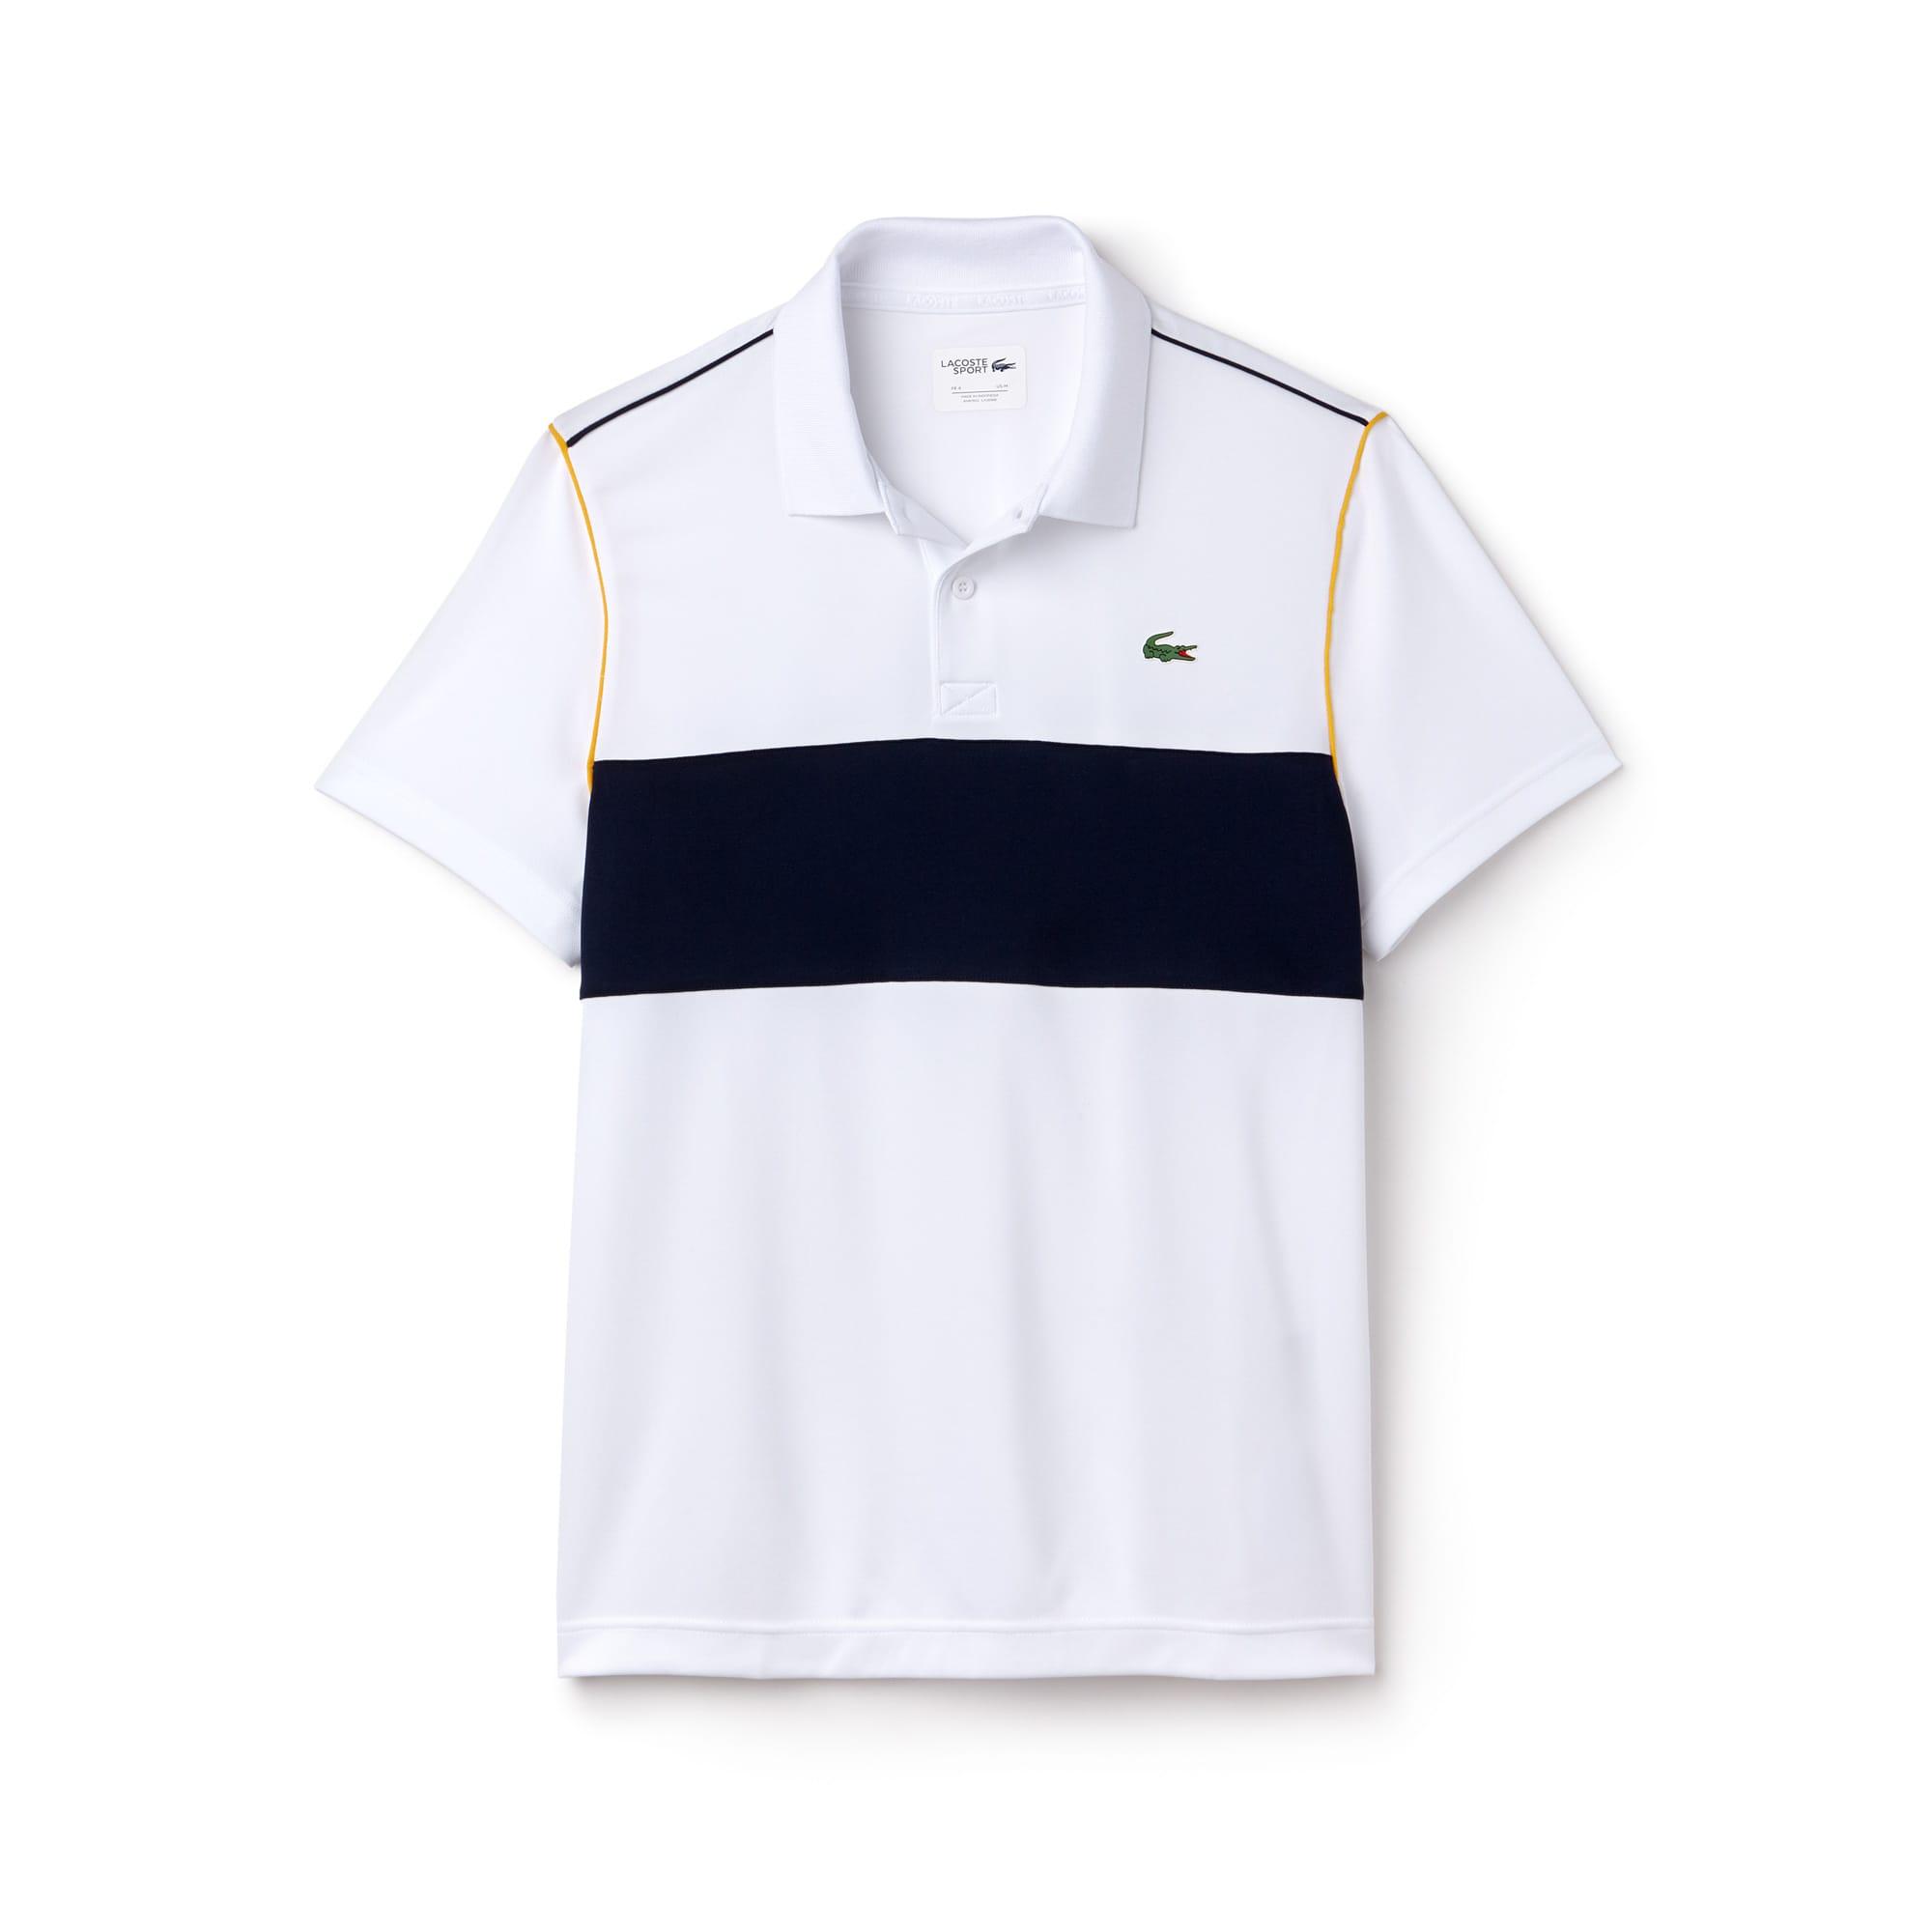 Herren LACOSTE SPORT Poloshirt aus Funktionspiqué mit Colorblocks